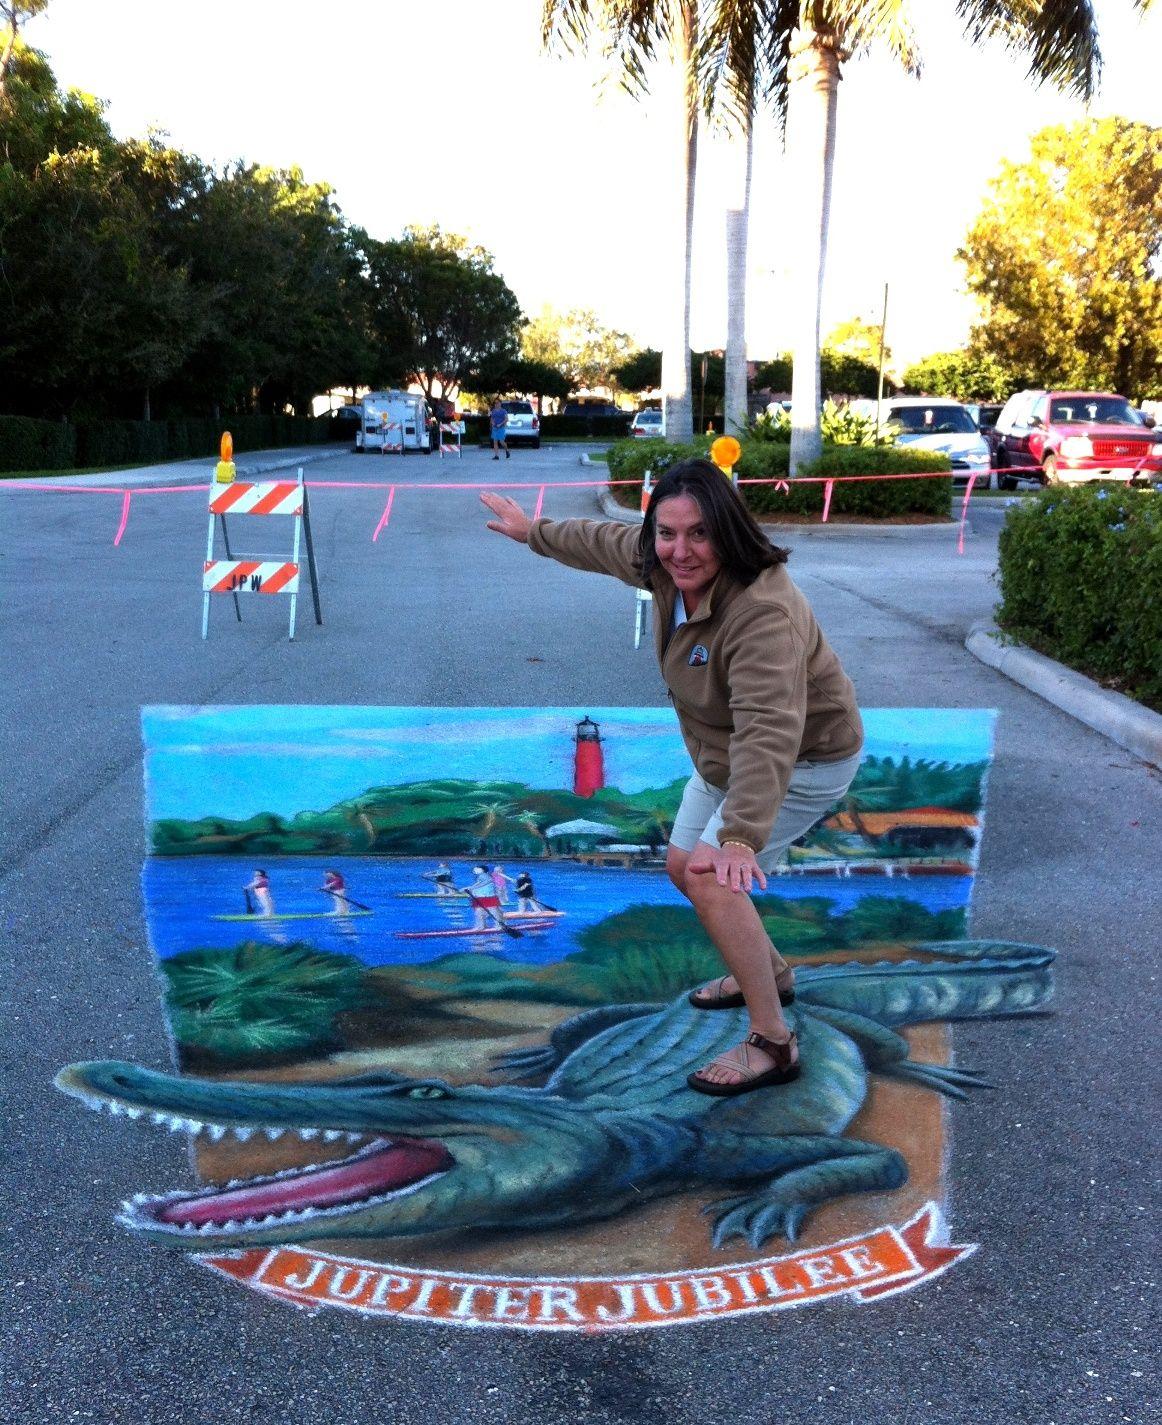 "Ann ""riding"" the 3D alligator - chalk art at Jupiter Jubilee 2013 by AmazingStreetPainting.com"